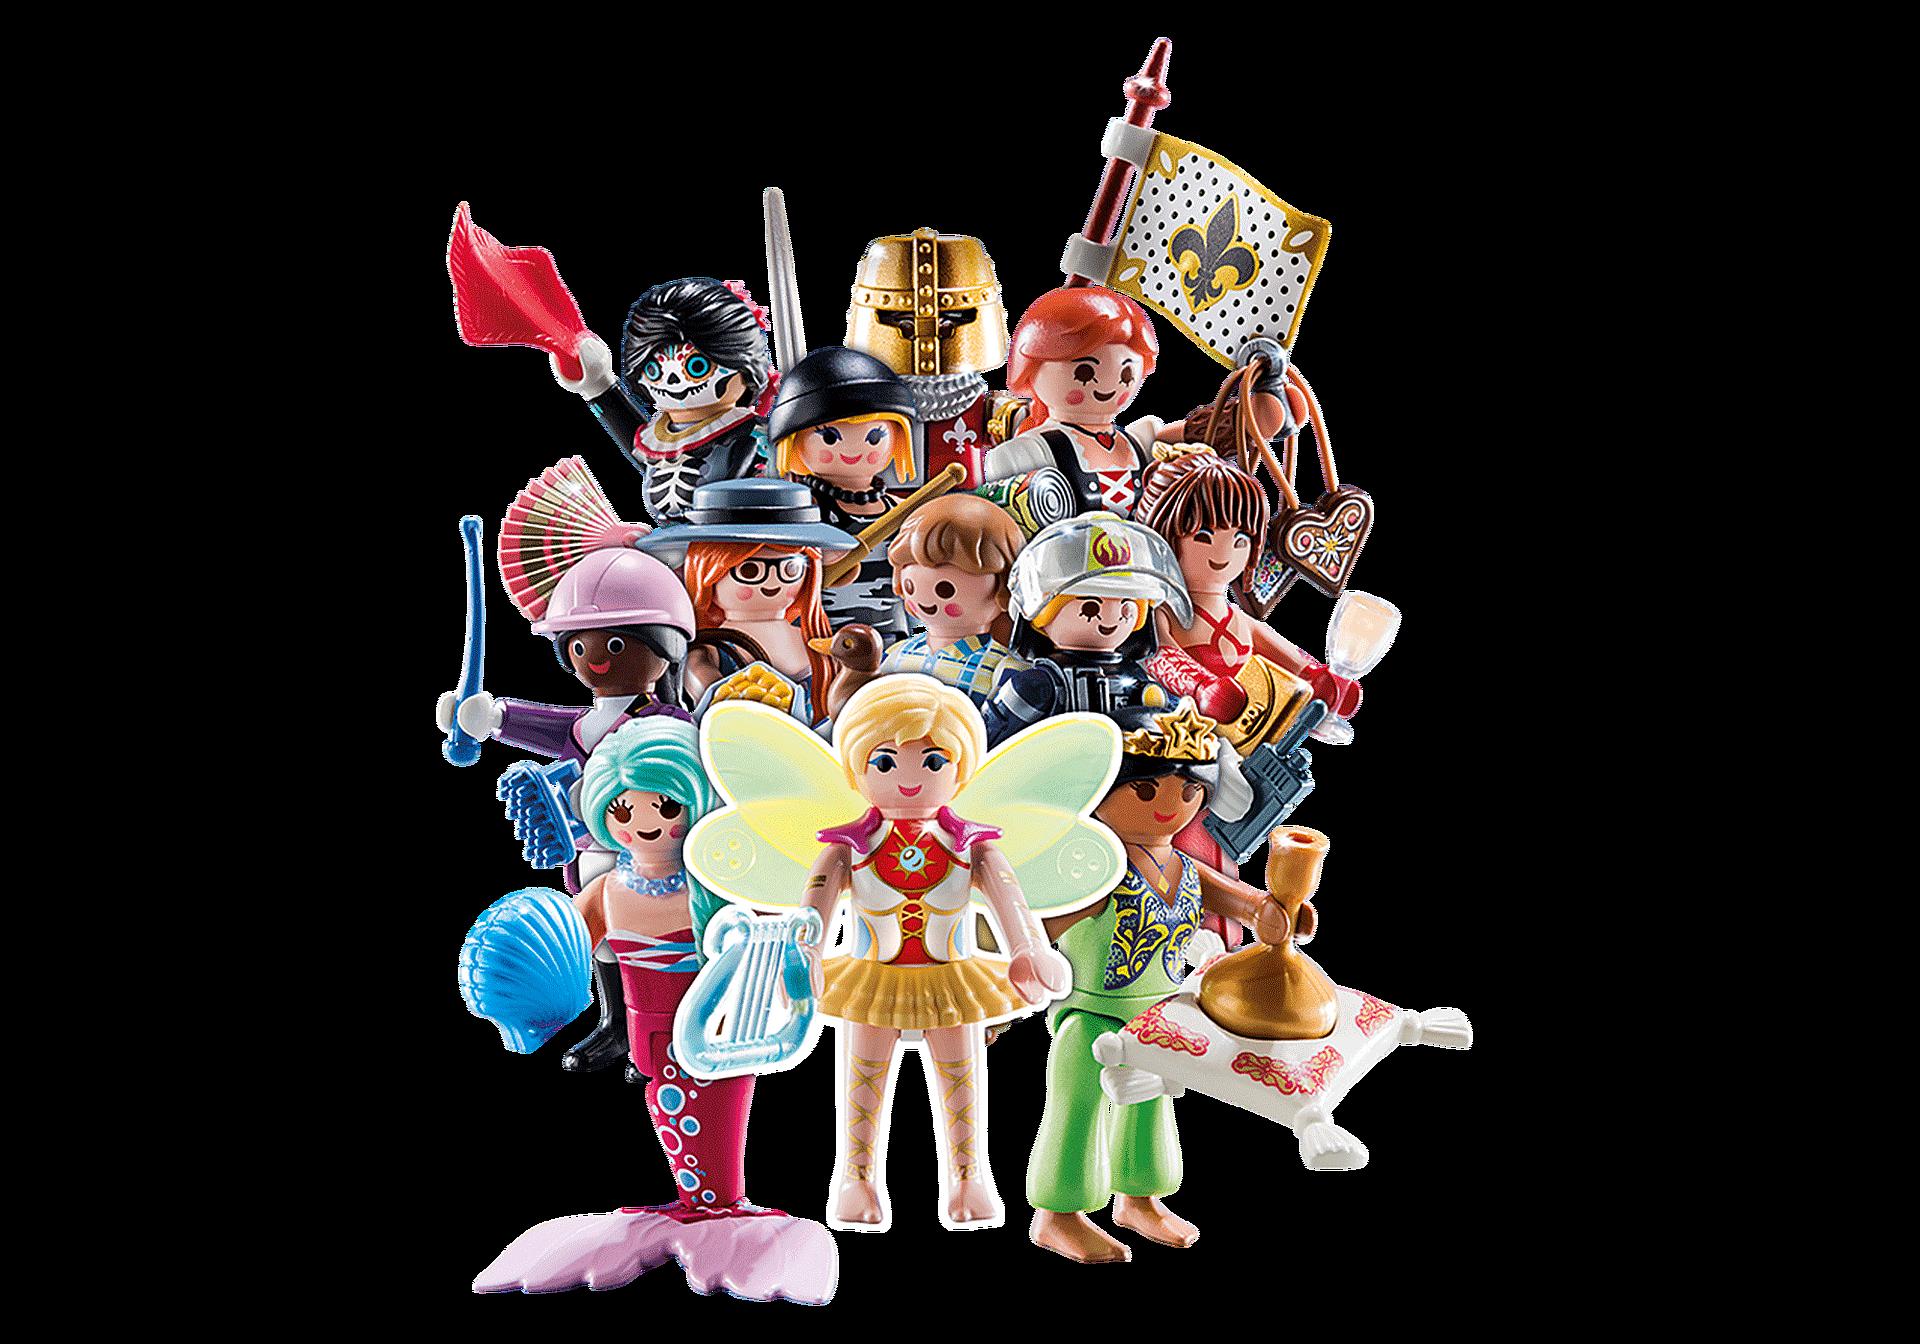 70149 PLAYMOBIL-Figures Girls (seria 20) zoom image1